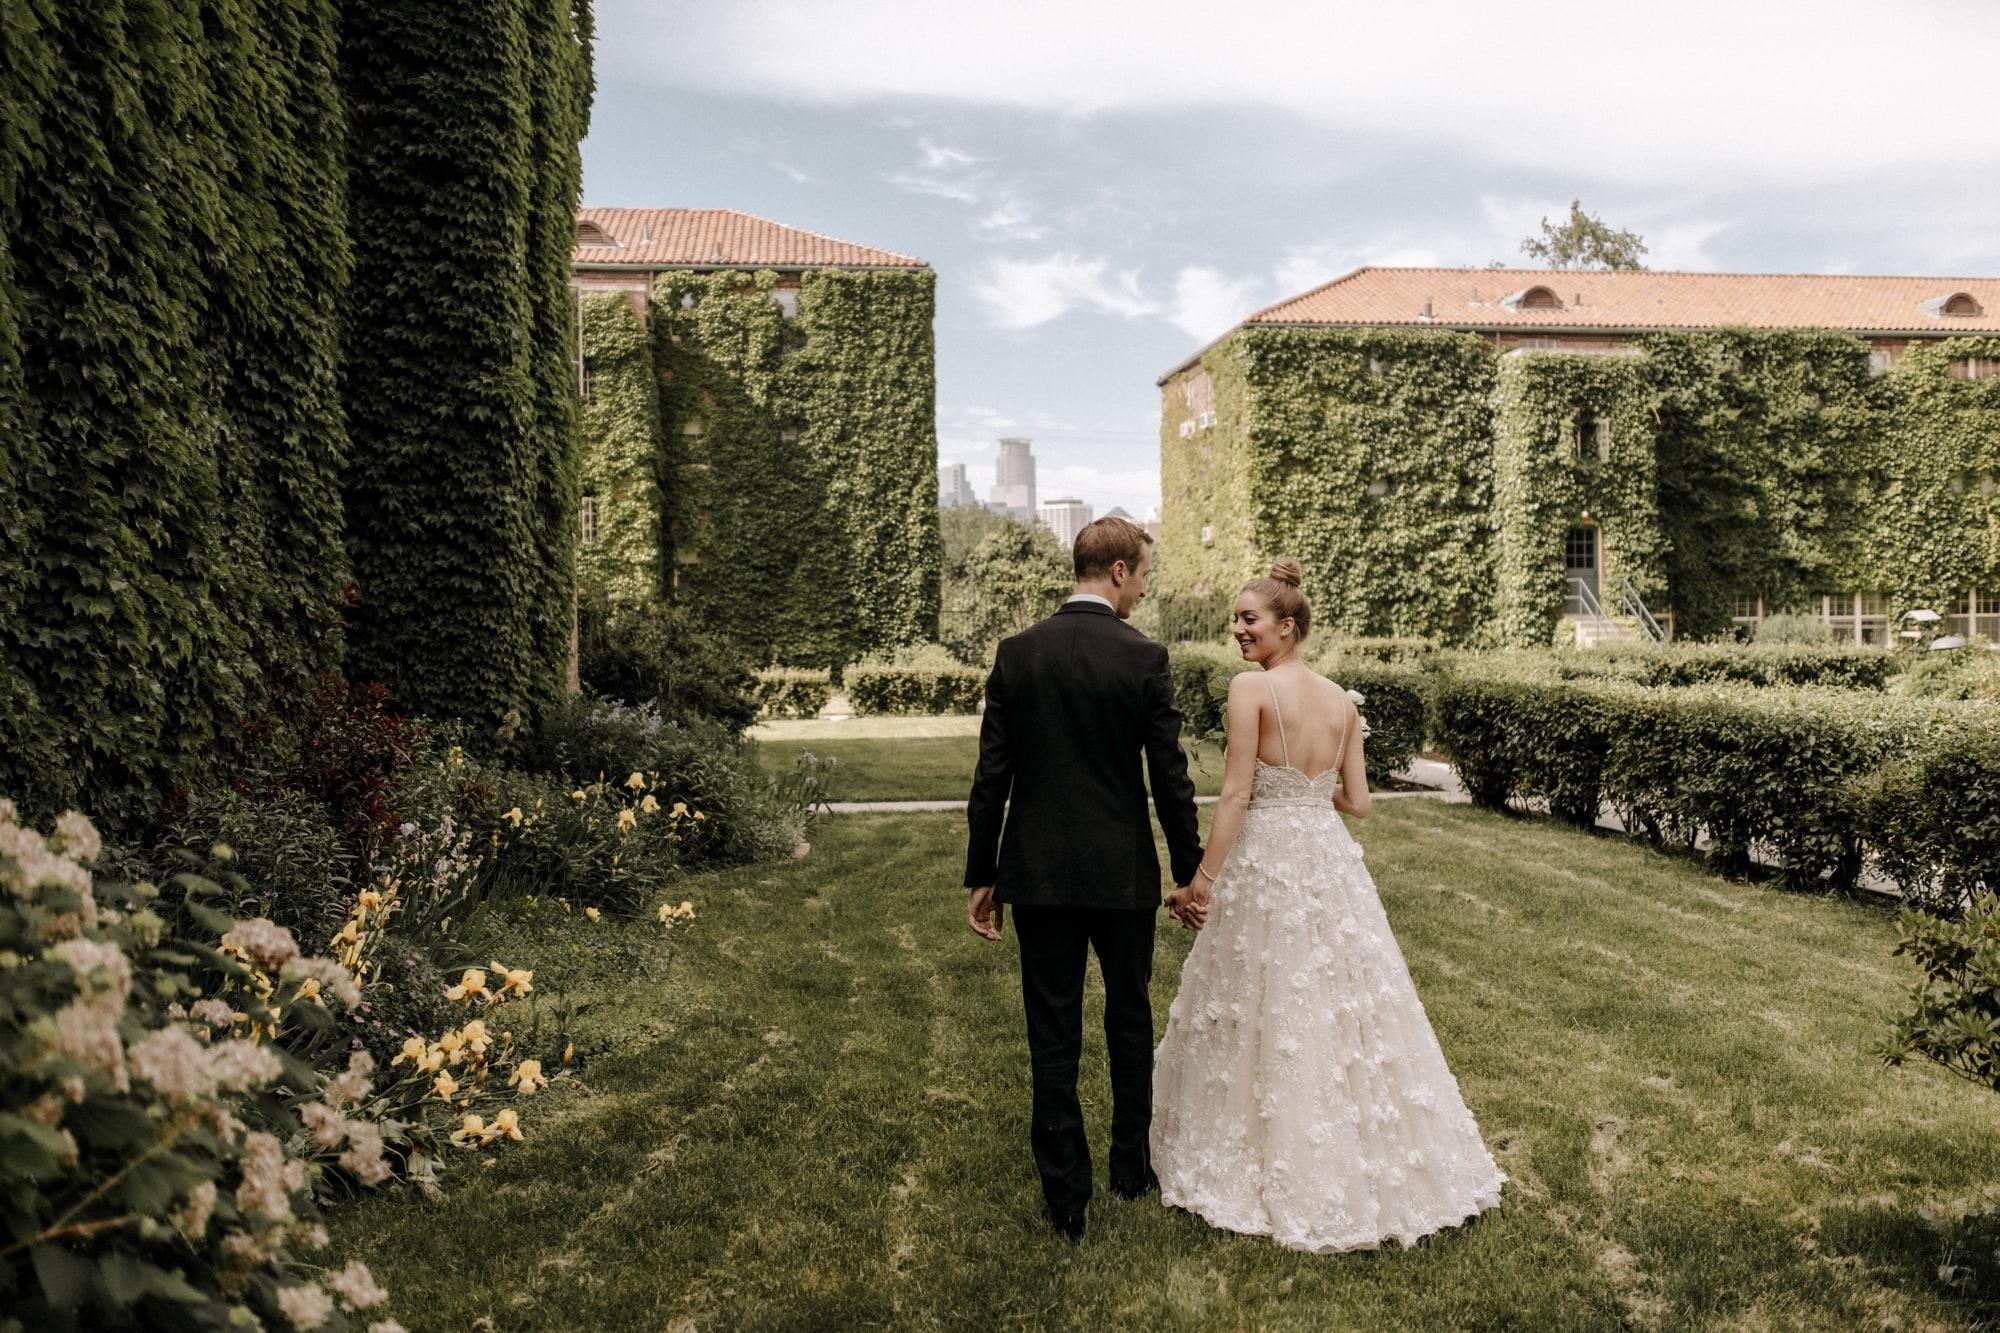 MIA-Minneapolis-Institute-Art-Summer-Wedding-_16.jpg